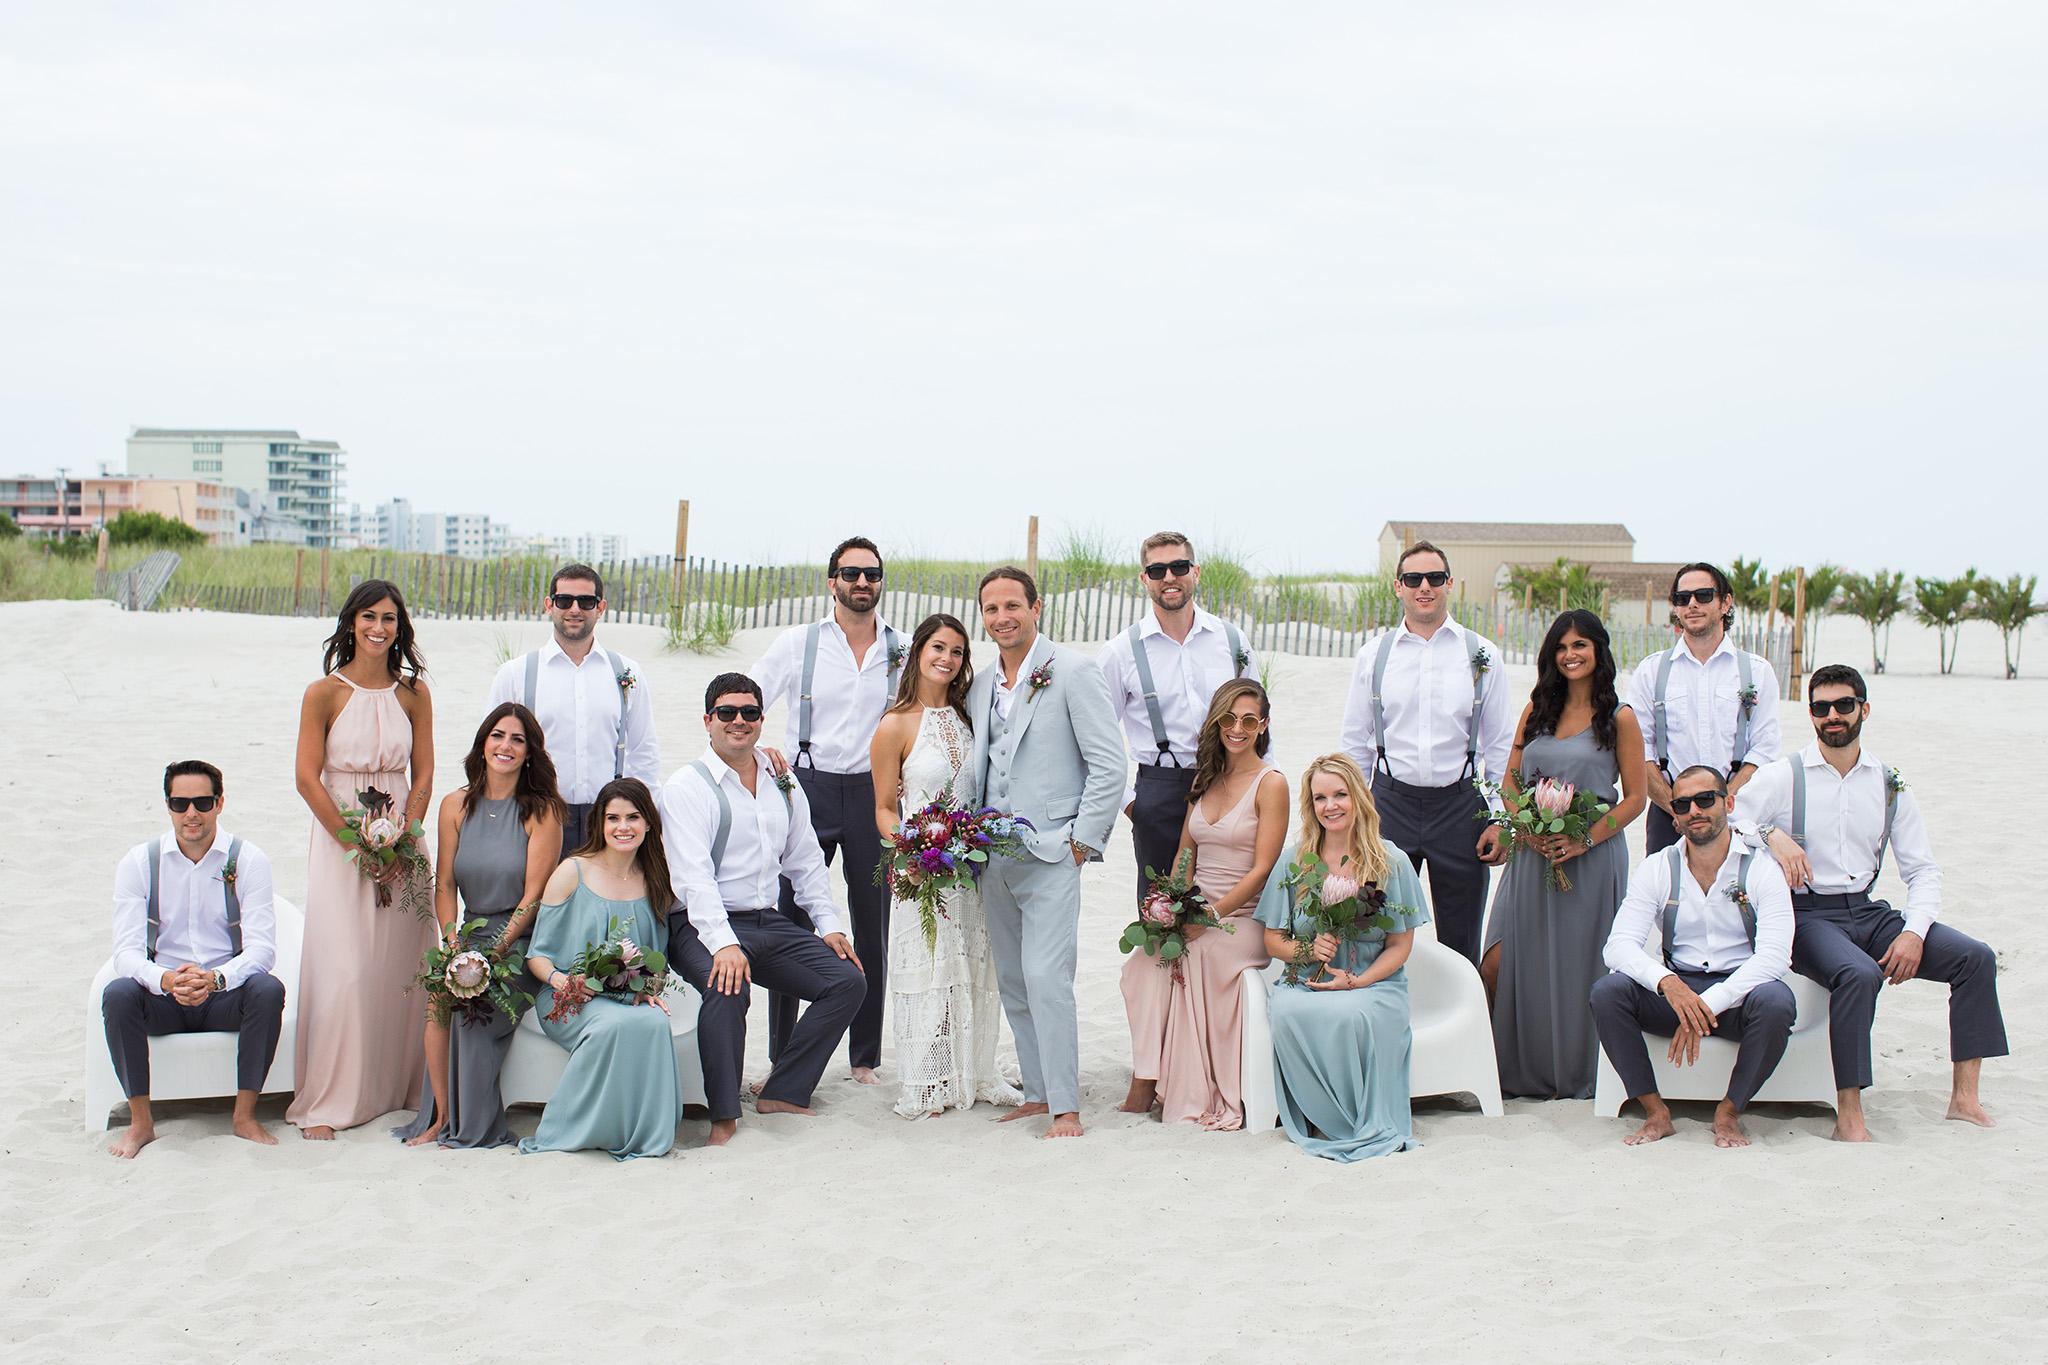 icona_diamond_beach_wedding_8.jpg